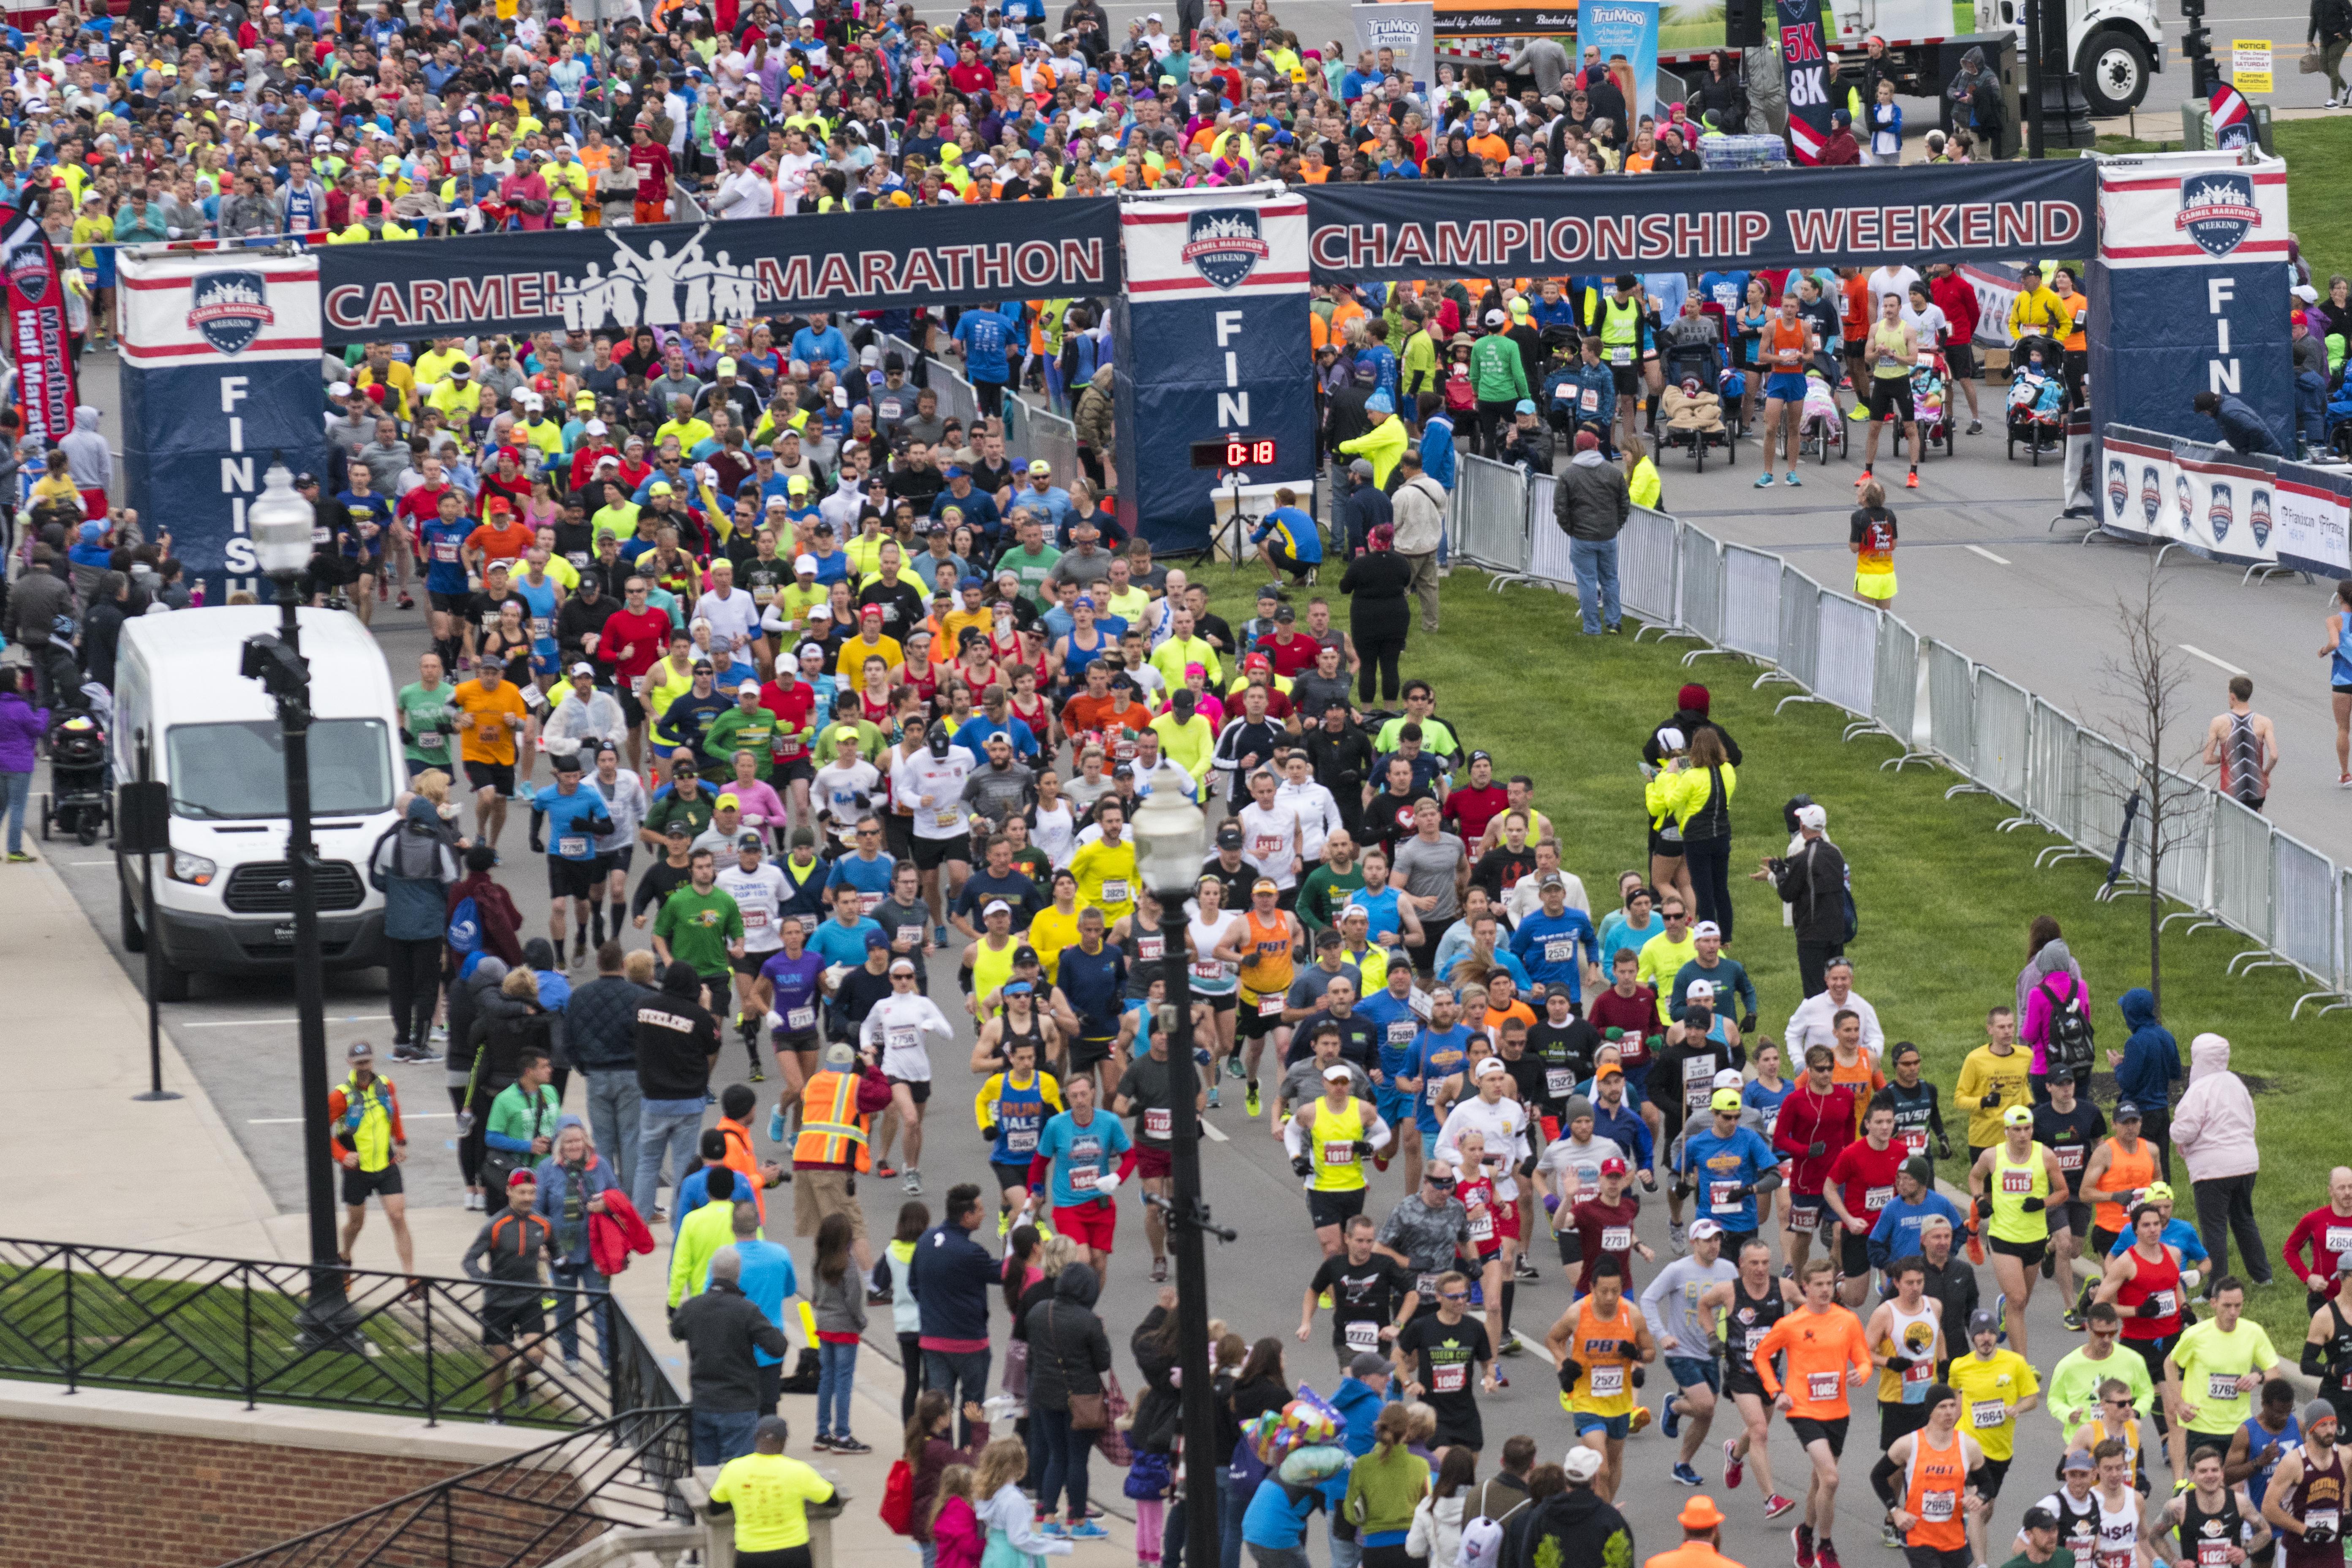 Carmel Marathon Photo by: Eldon Lindsay - 2017